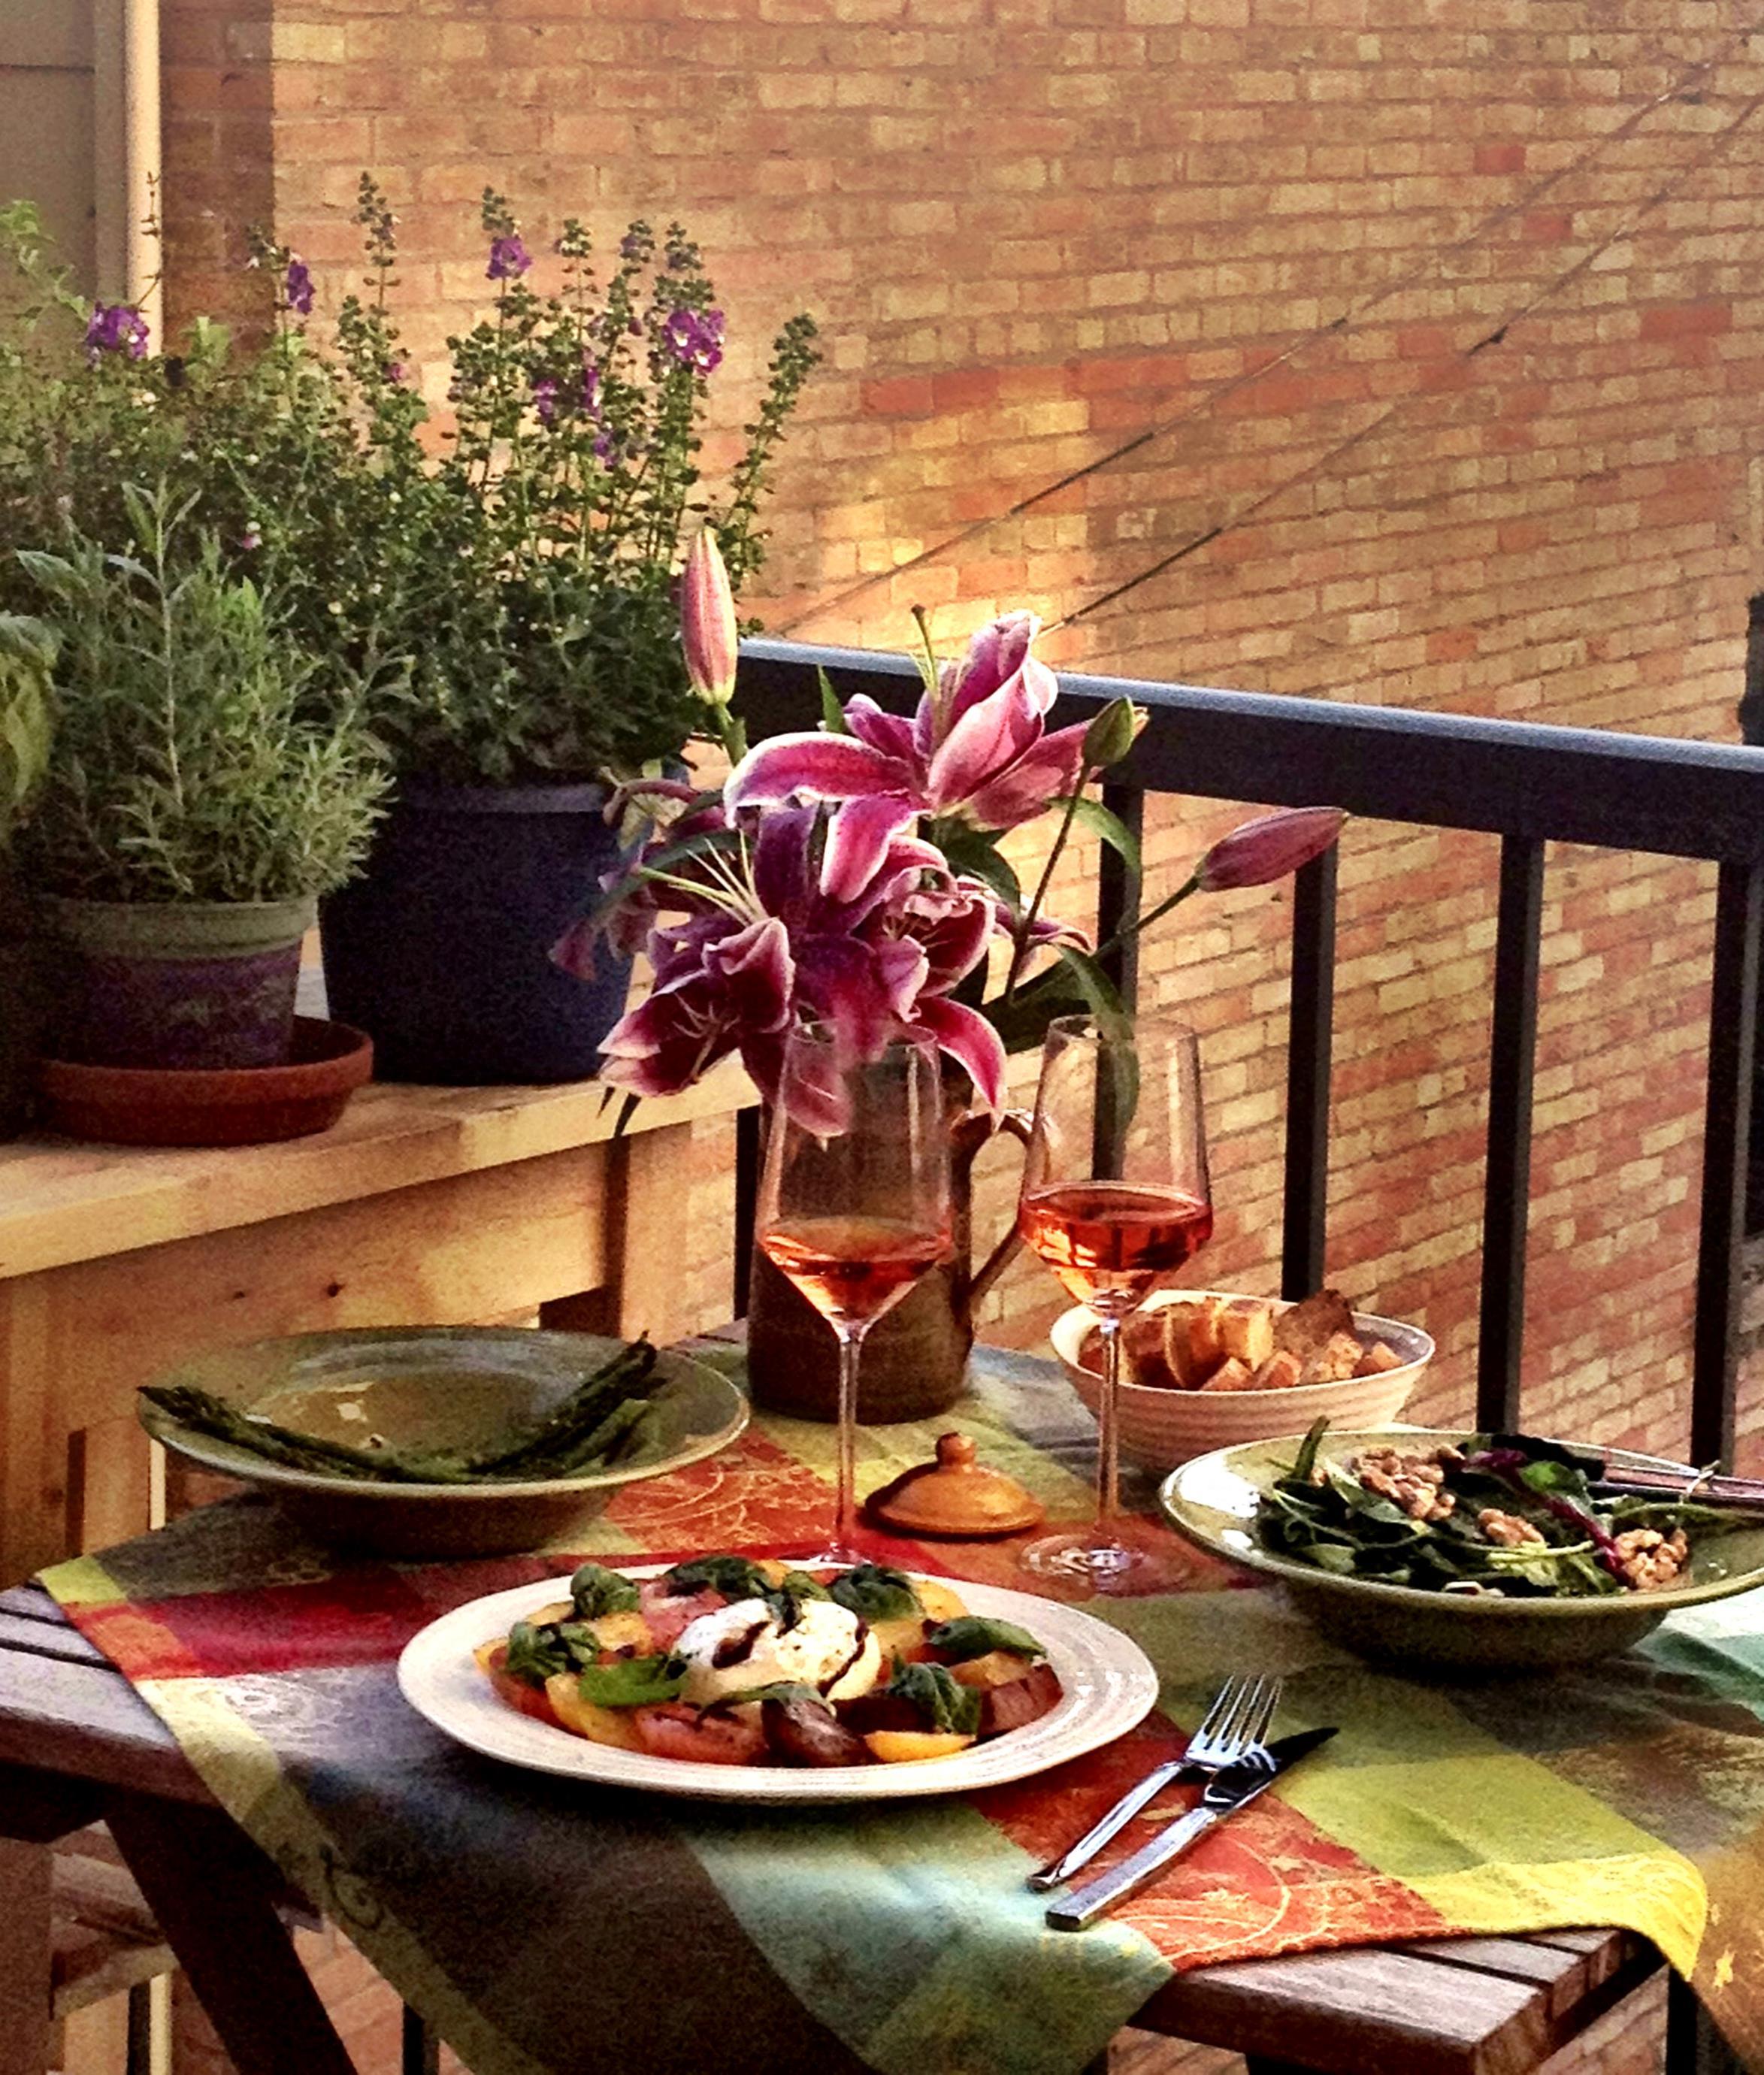 Dining al fresco; local burrata & hotchkiss heirloom tomato salad.